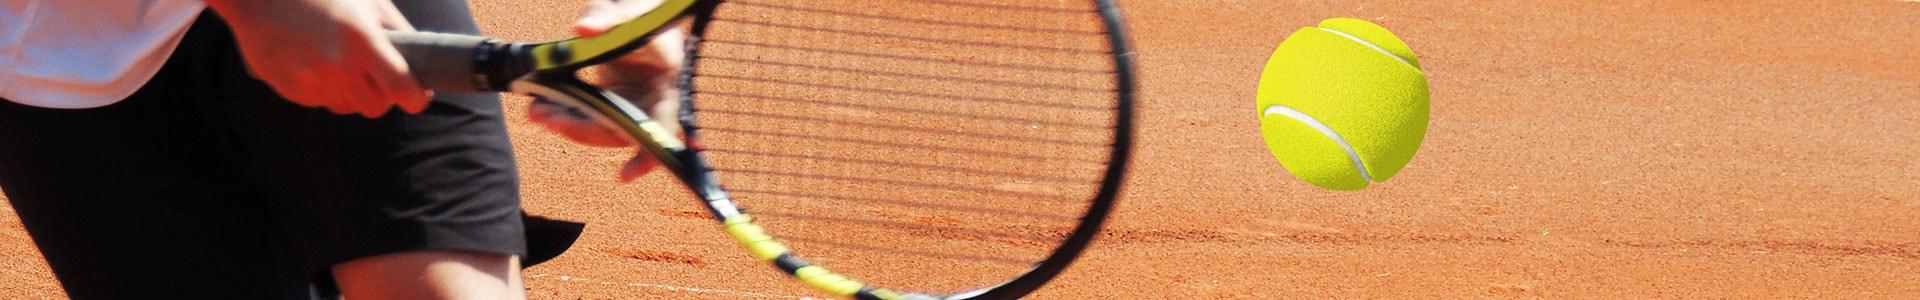 Tennis - TUI